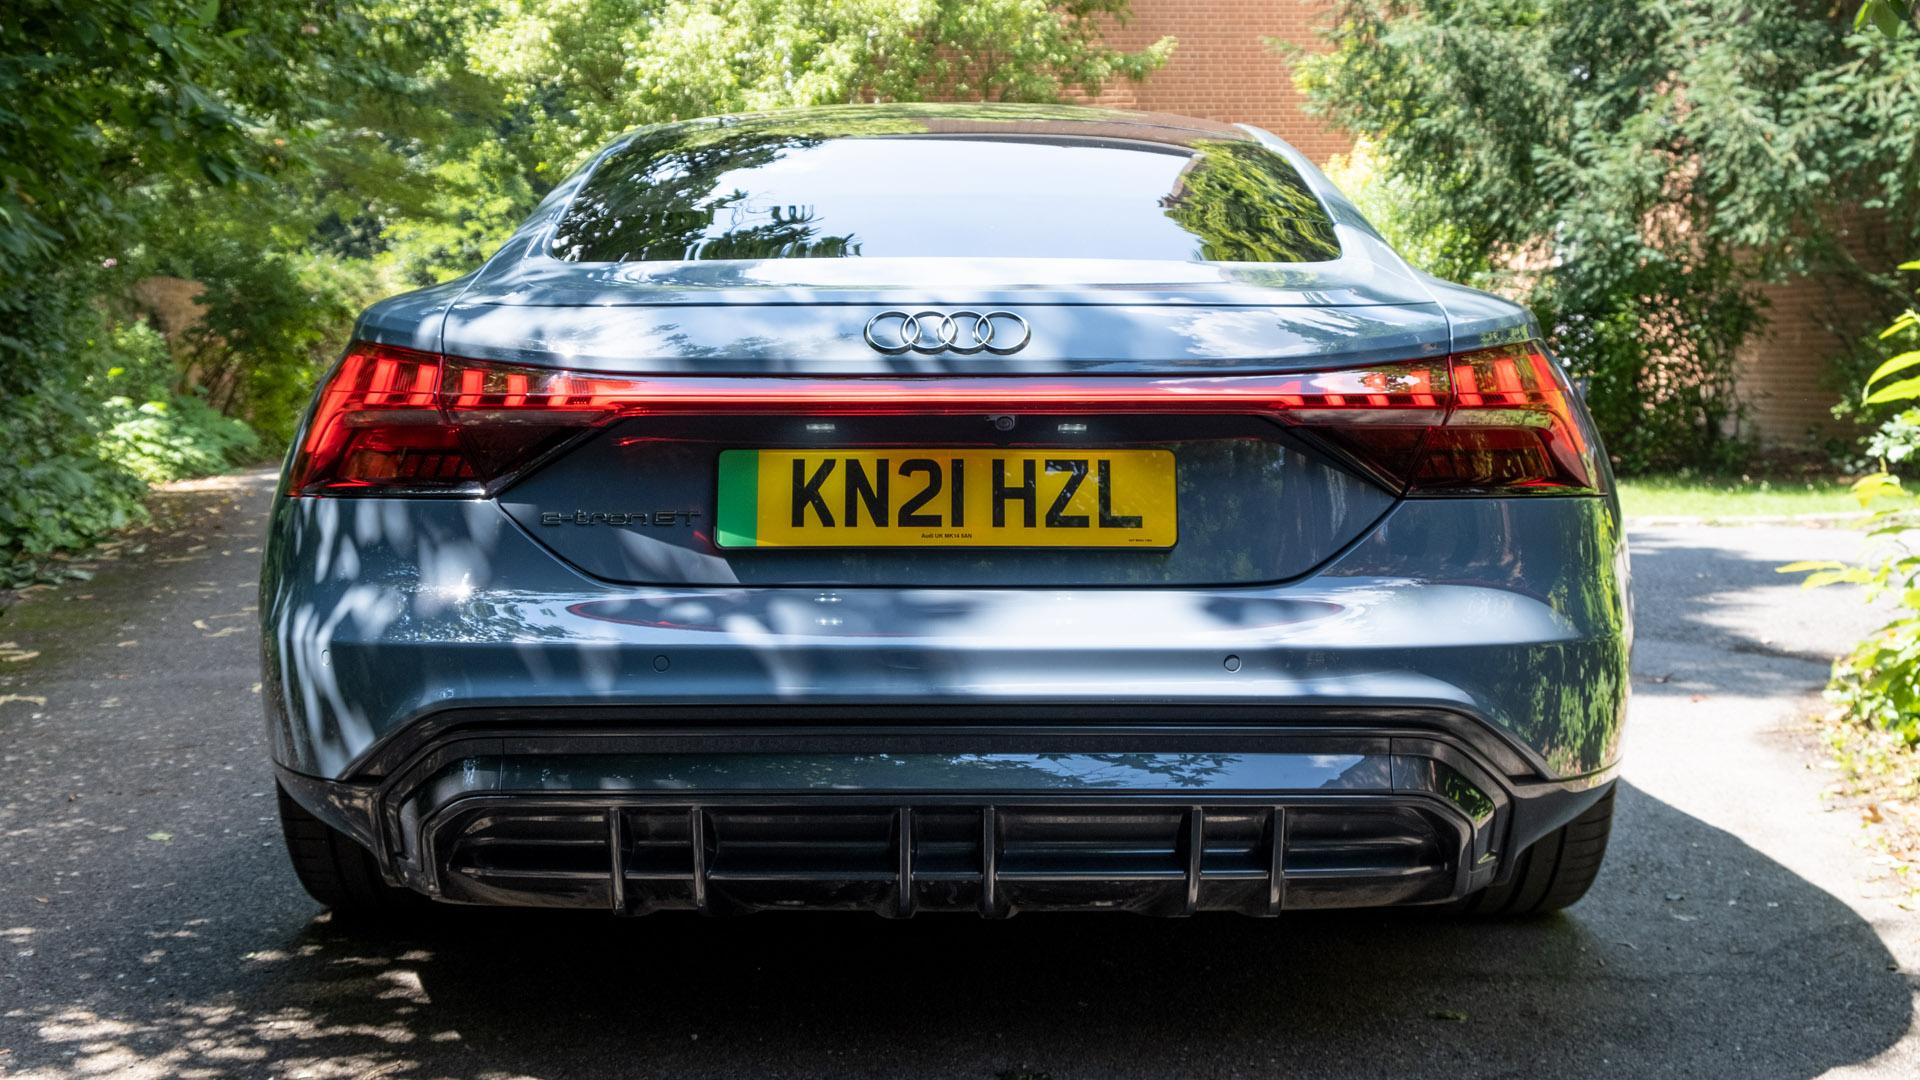 Audi e-tron GT rear lights